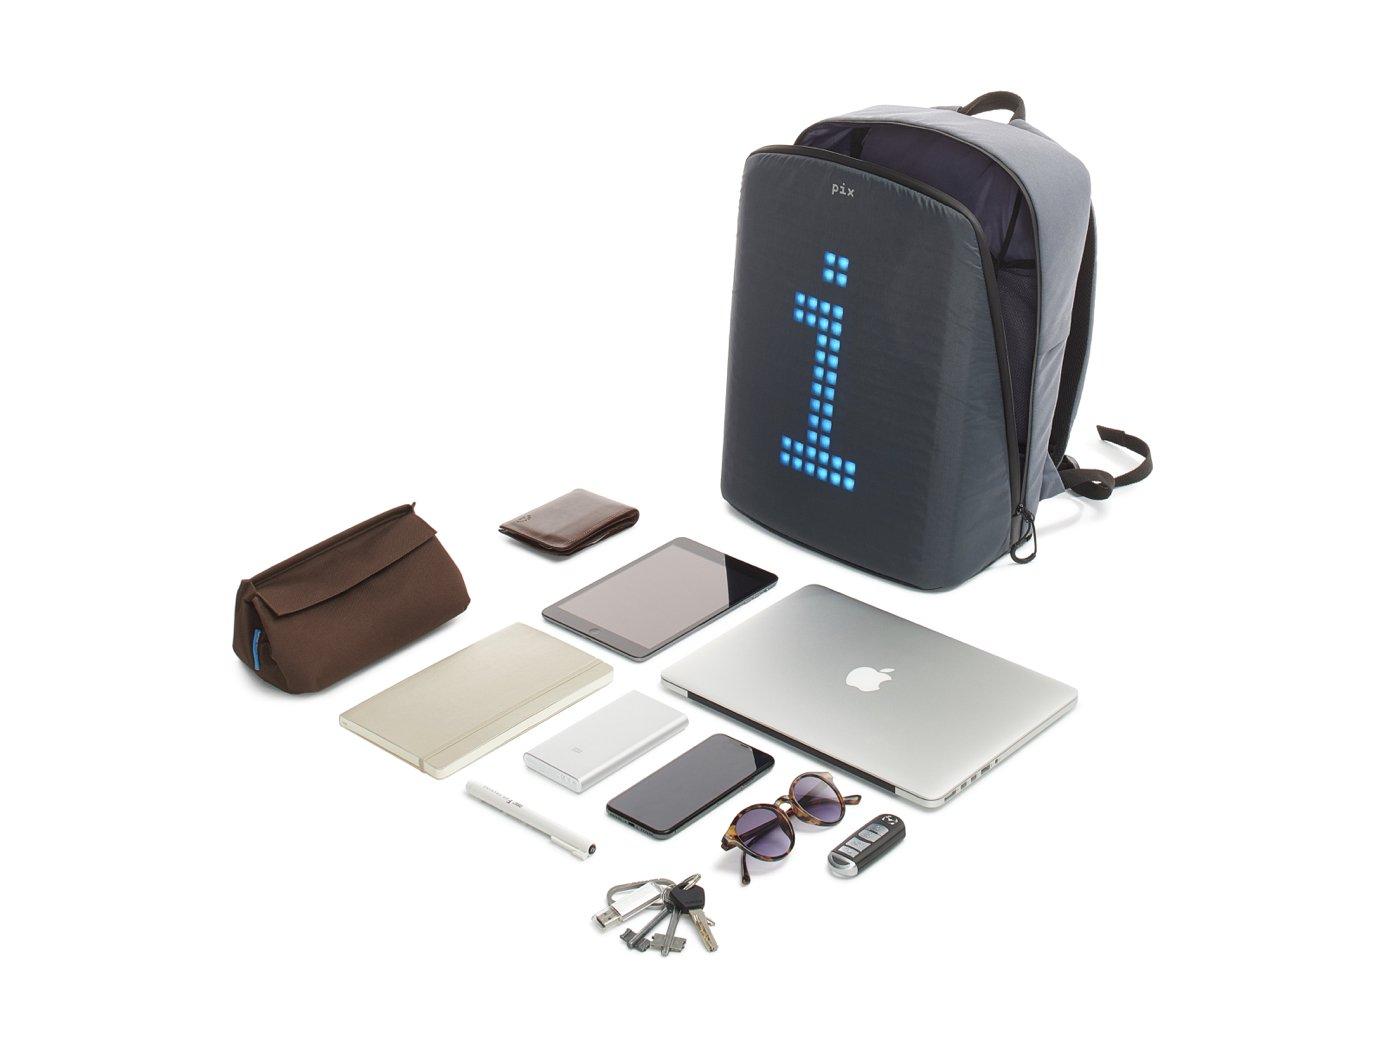 Pix Digital Customizable Backpack – oh that tech